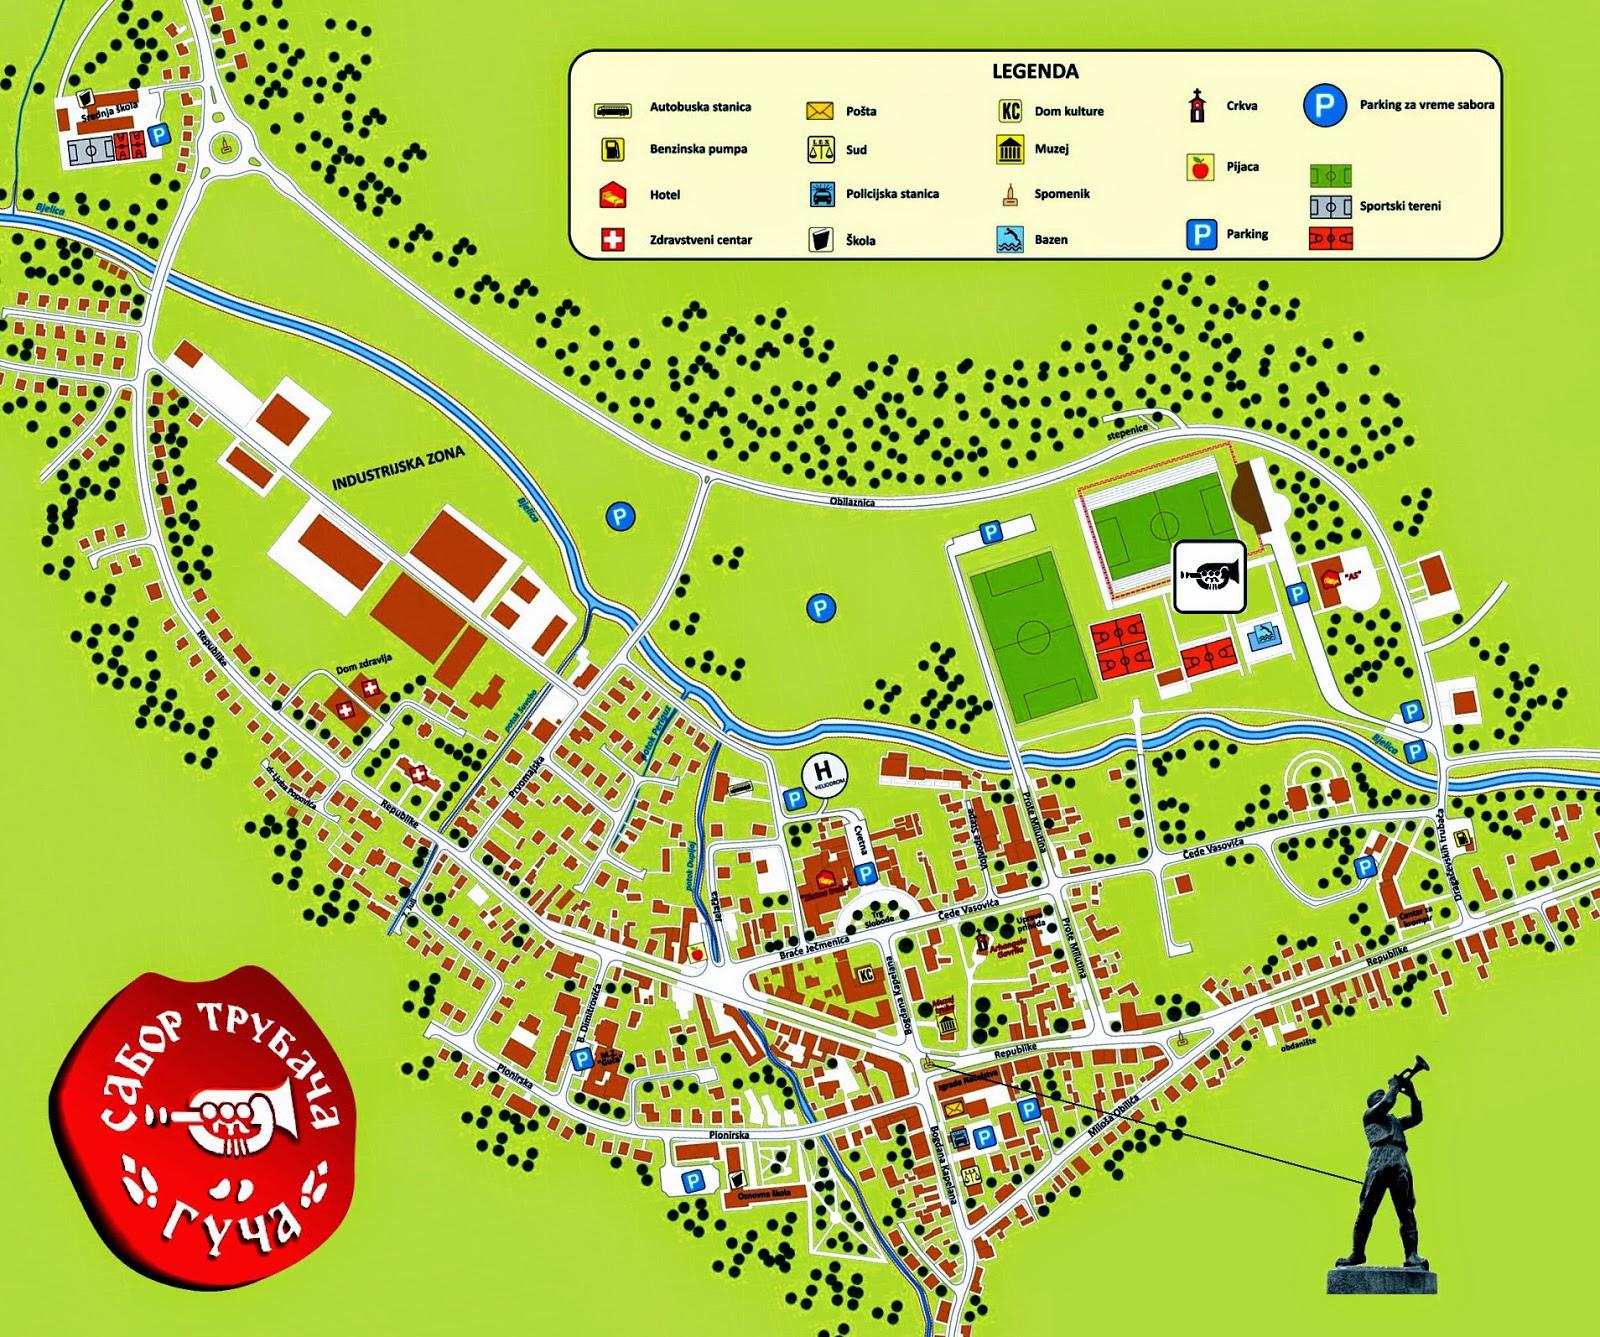 Mapa de Guca